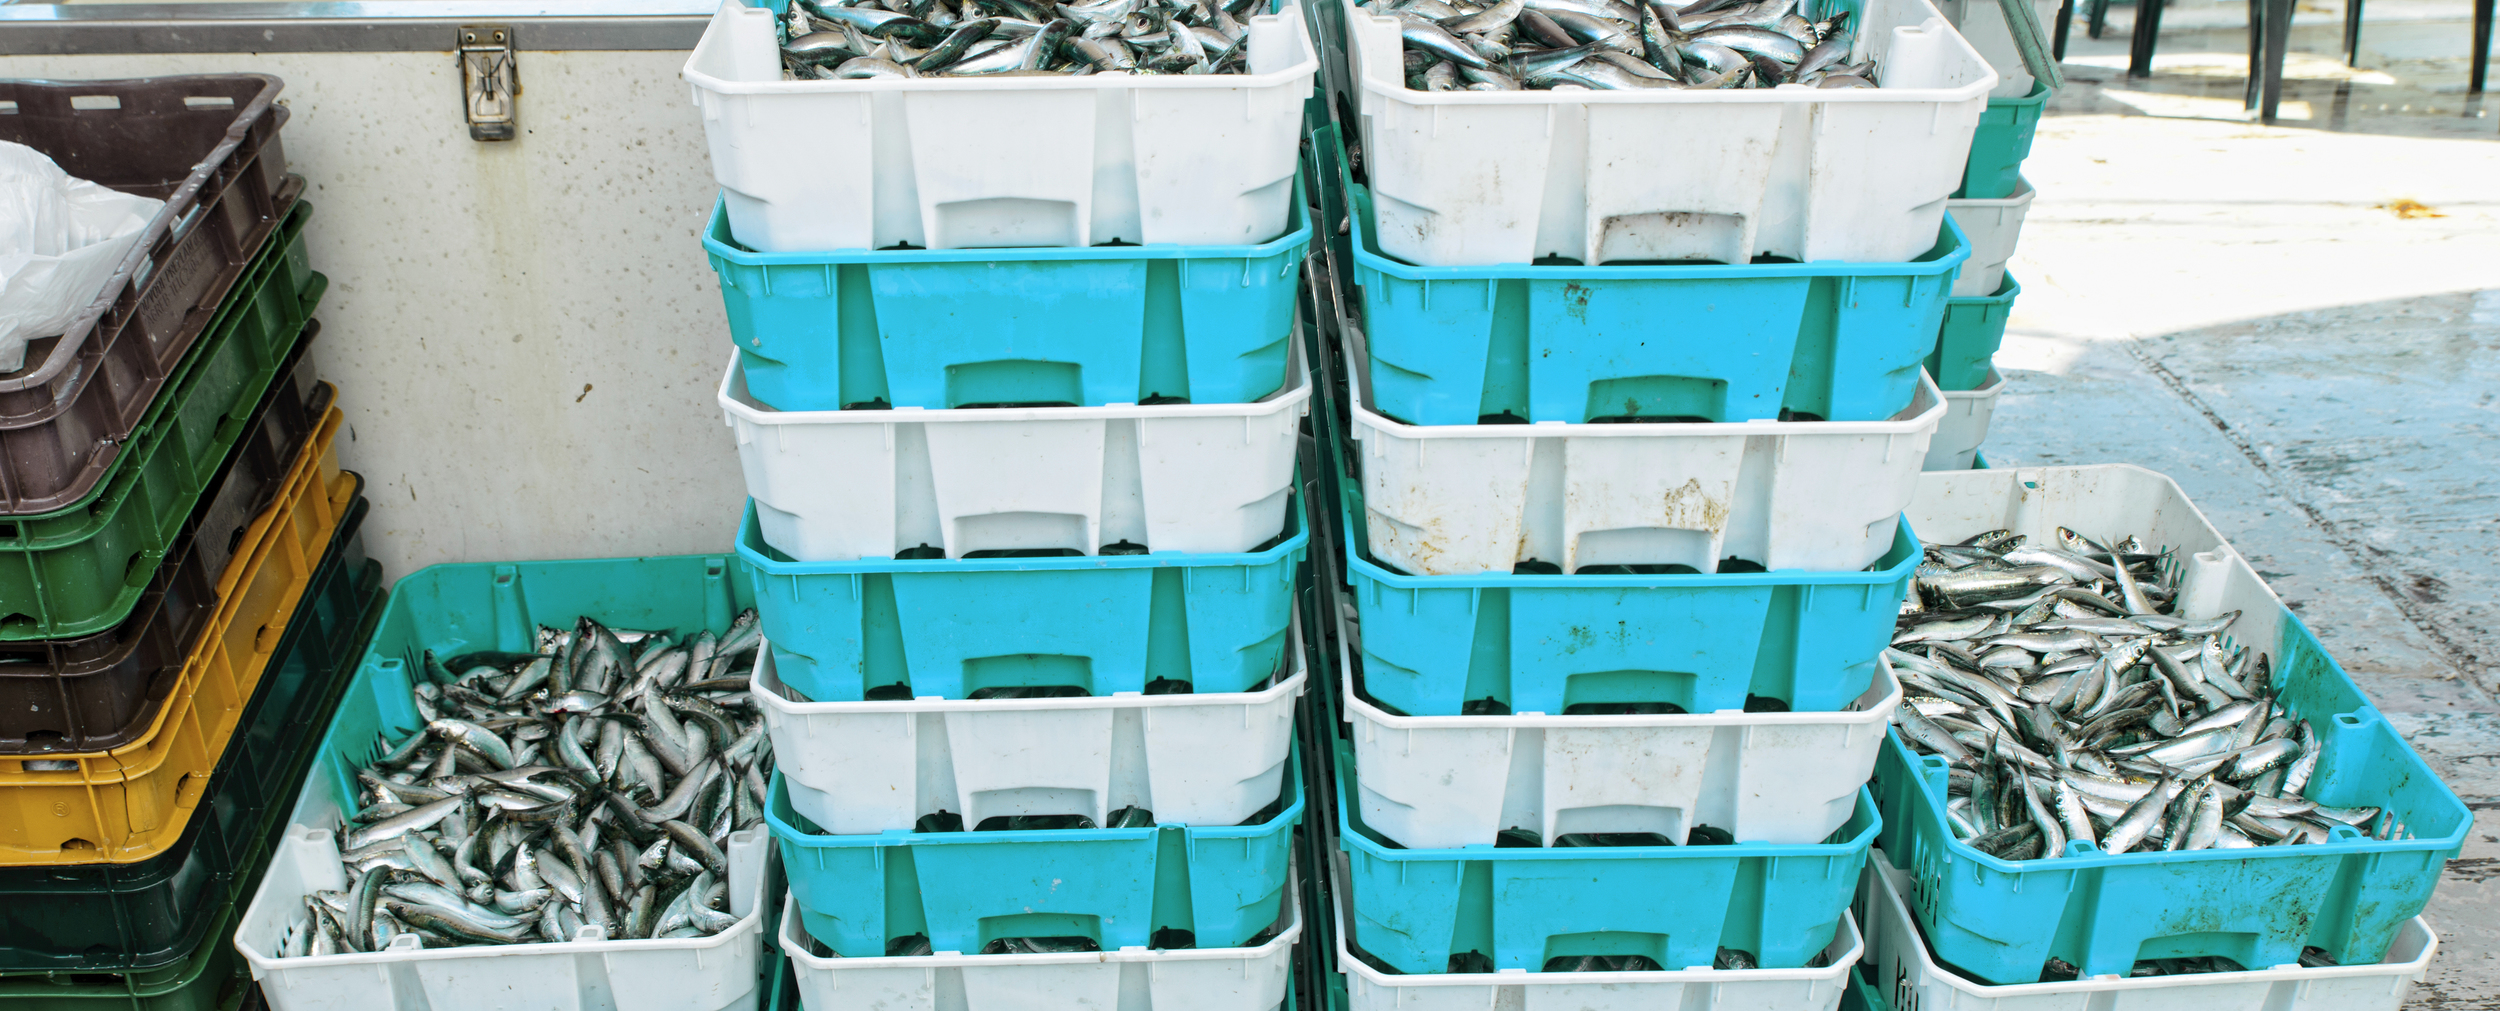 stock-photo-47699822-fresh-fish-in-crates.jpg